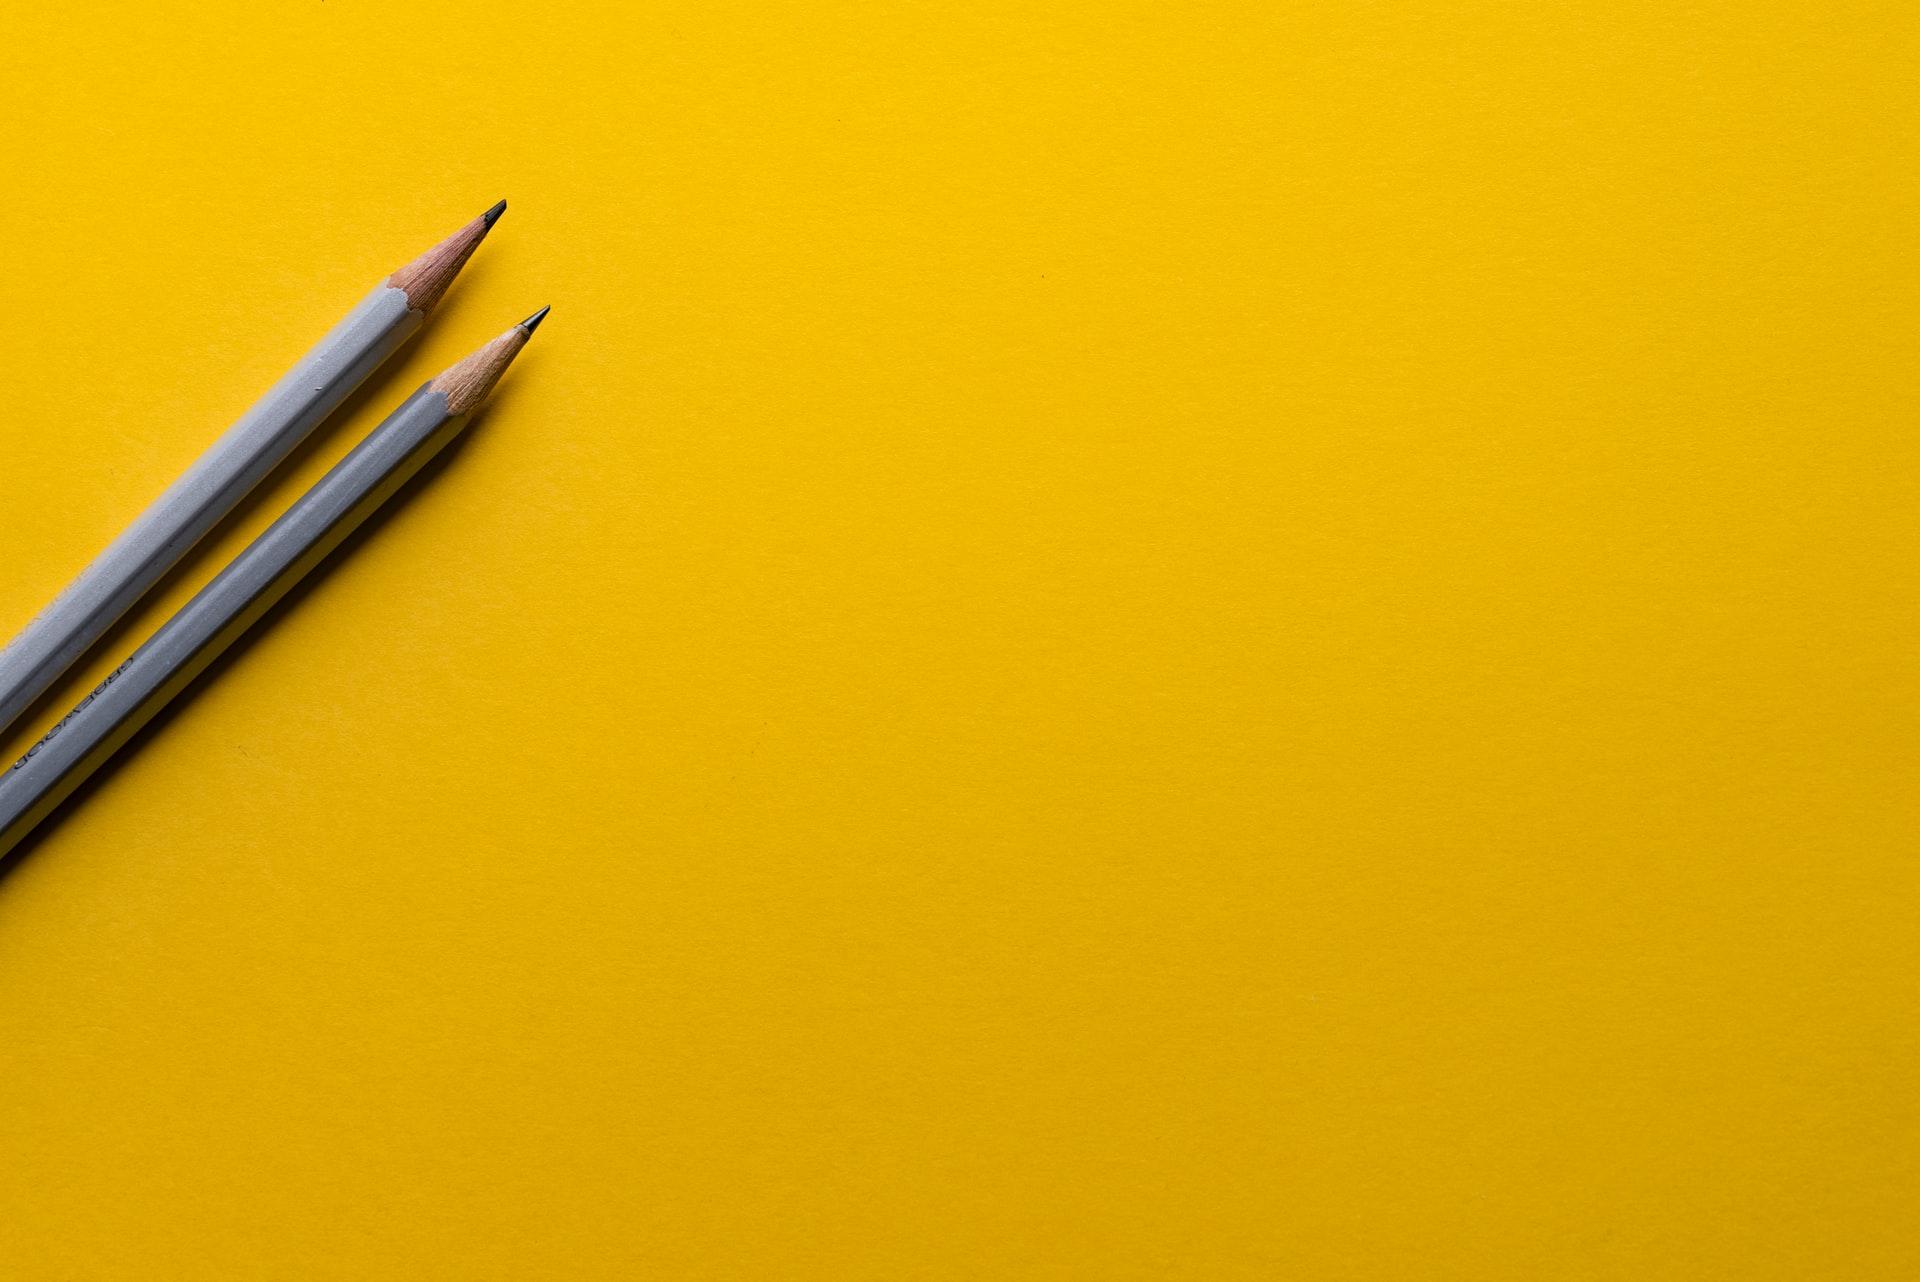 crayon de plond sur fond jaune